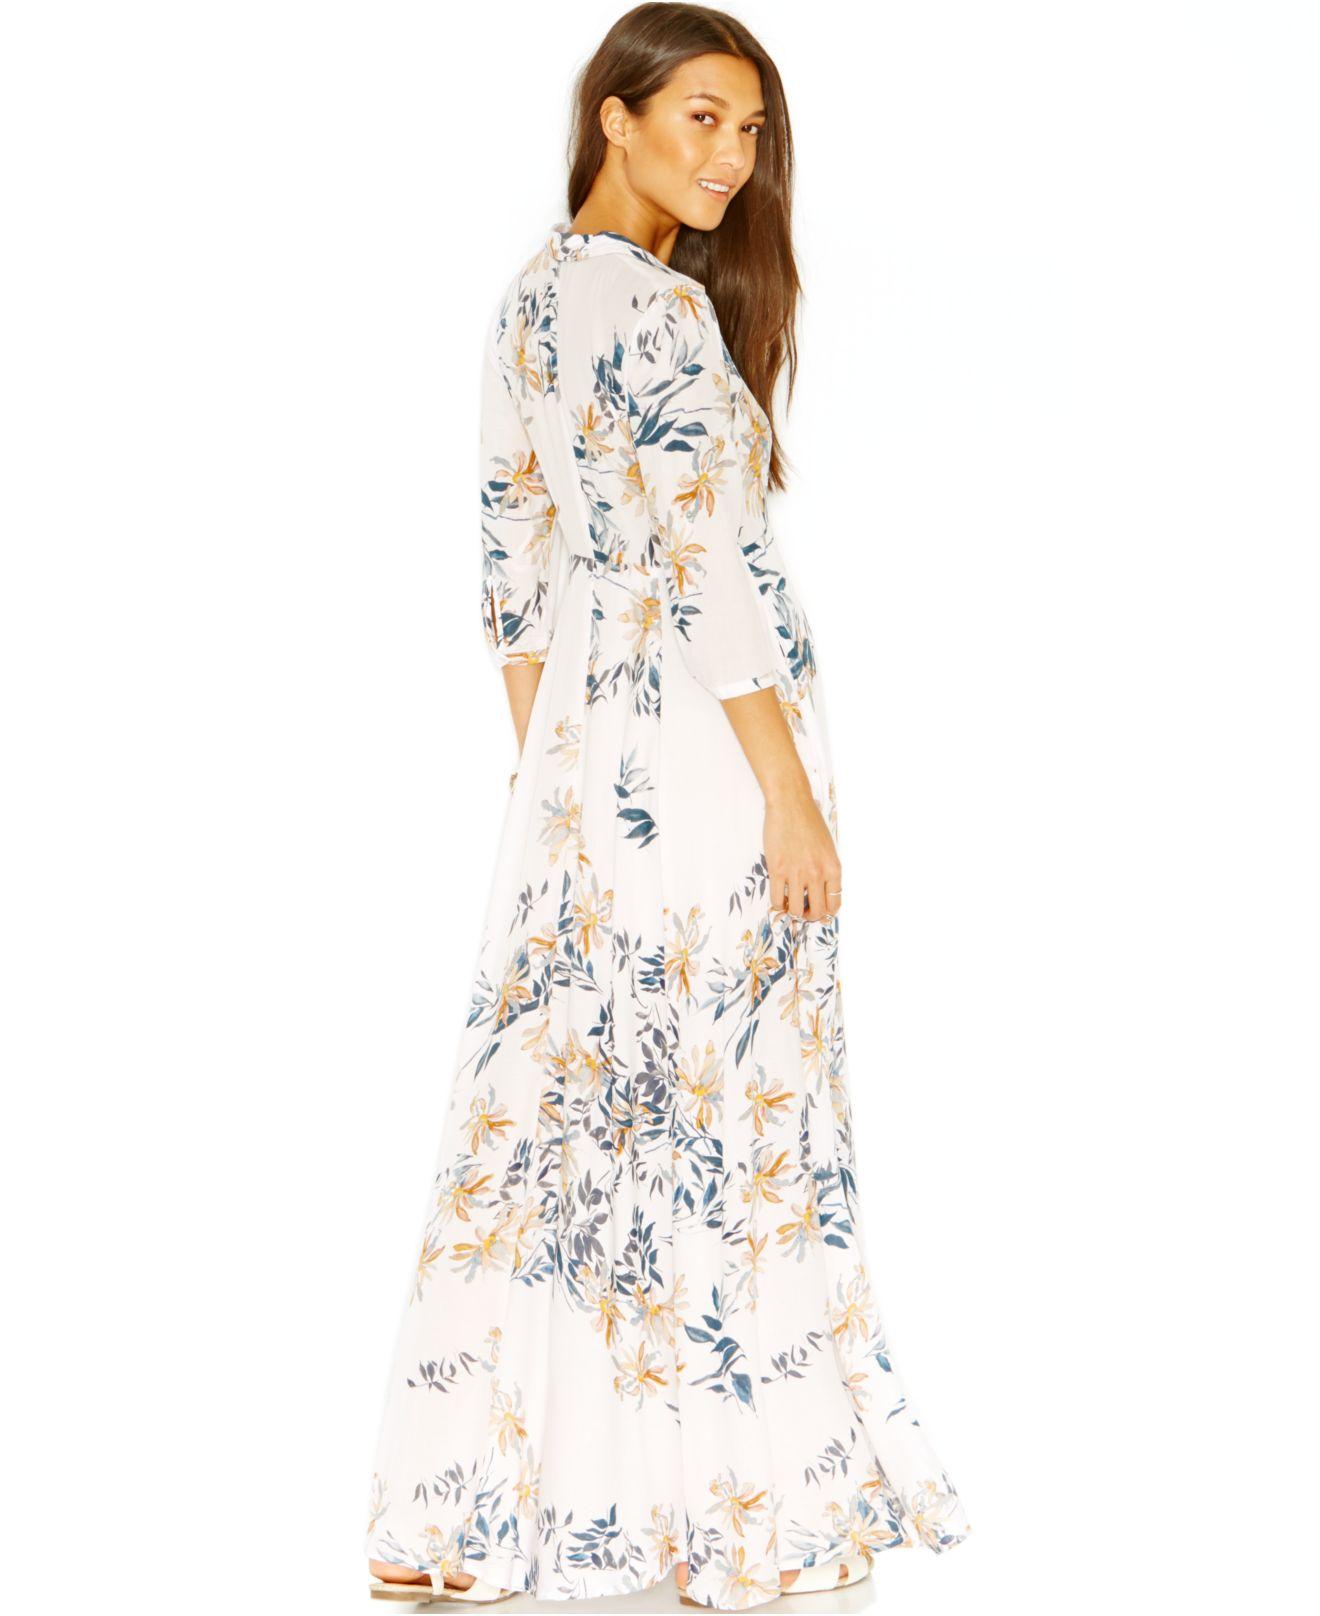 Floral Dress Maxi White